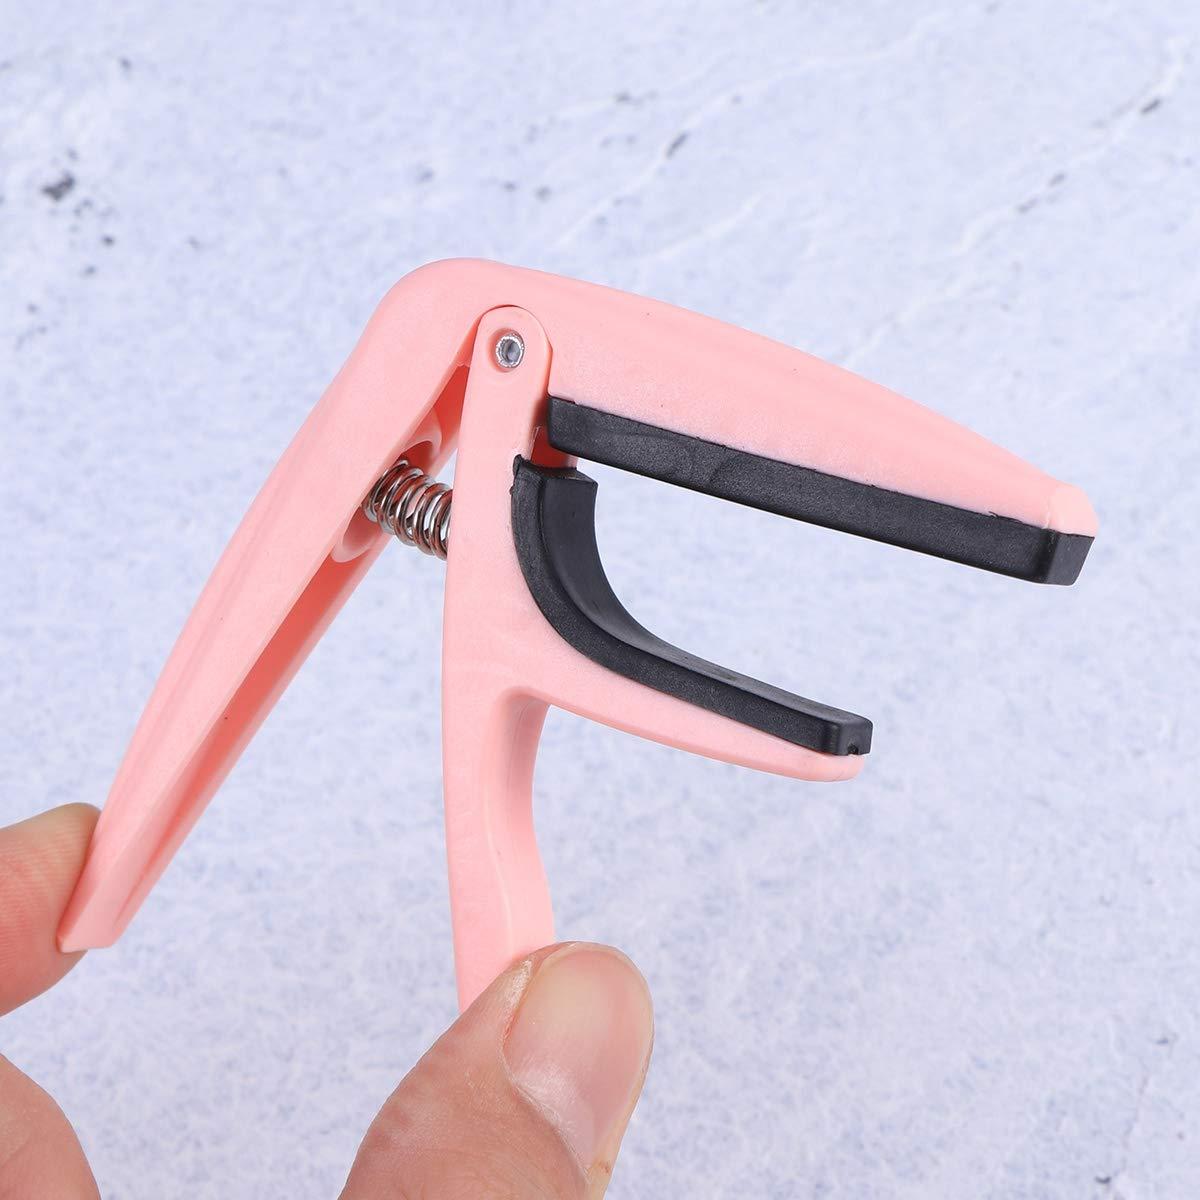 LIOOBO Professional Ukulele Capo Single-Handed Quick Change Ukelele Capo zinc Alloy Guitar Parts Accessories Pink